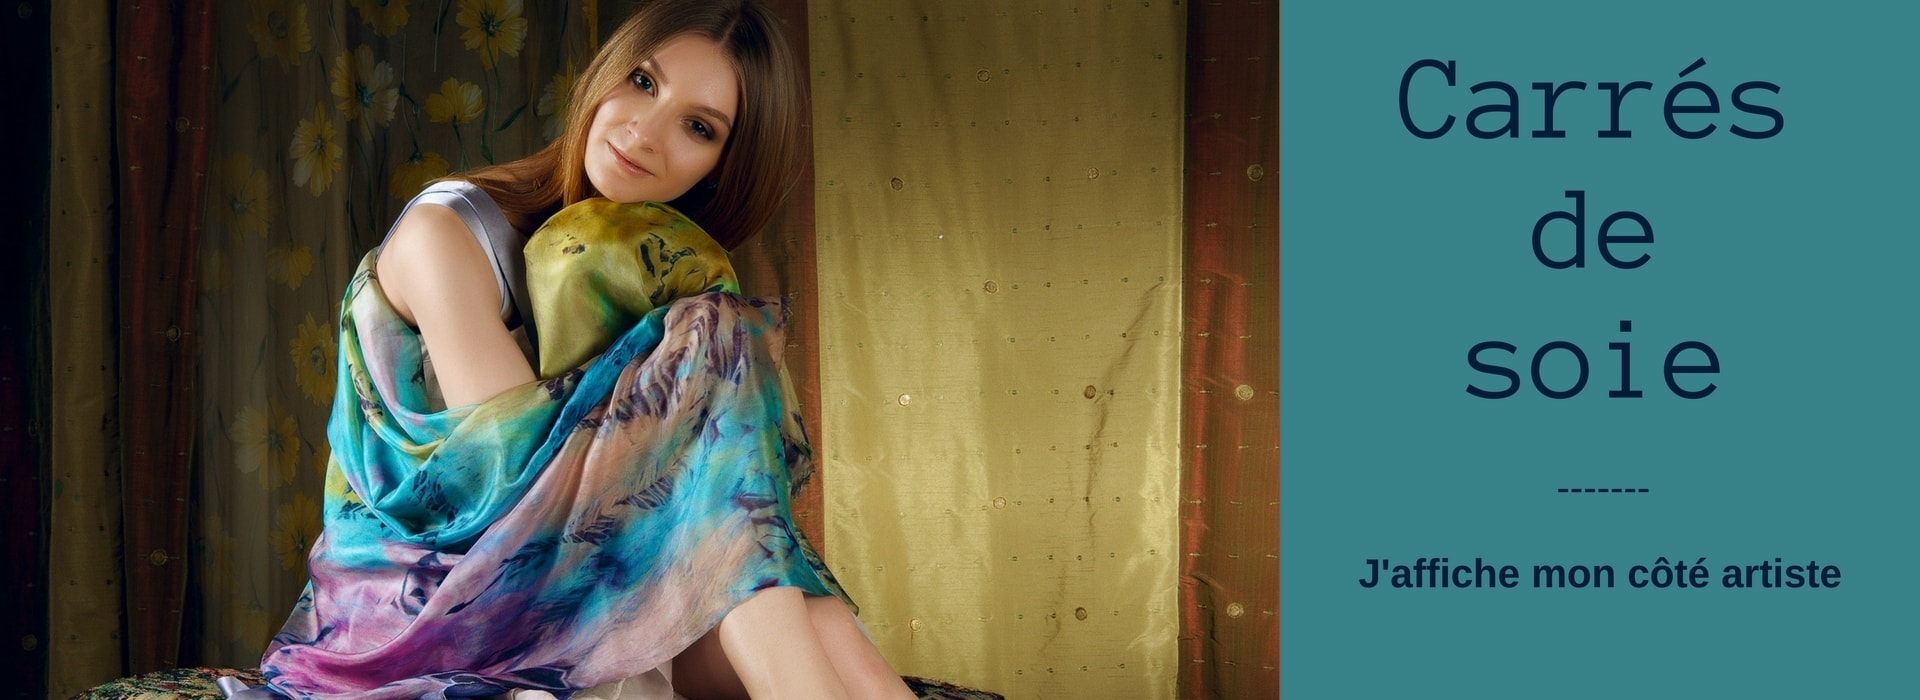 foulard carre de soie